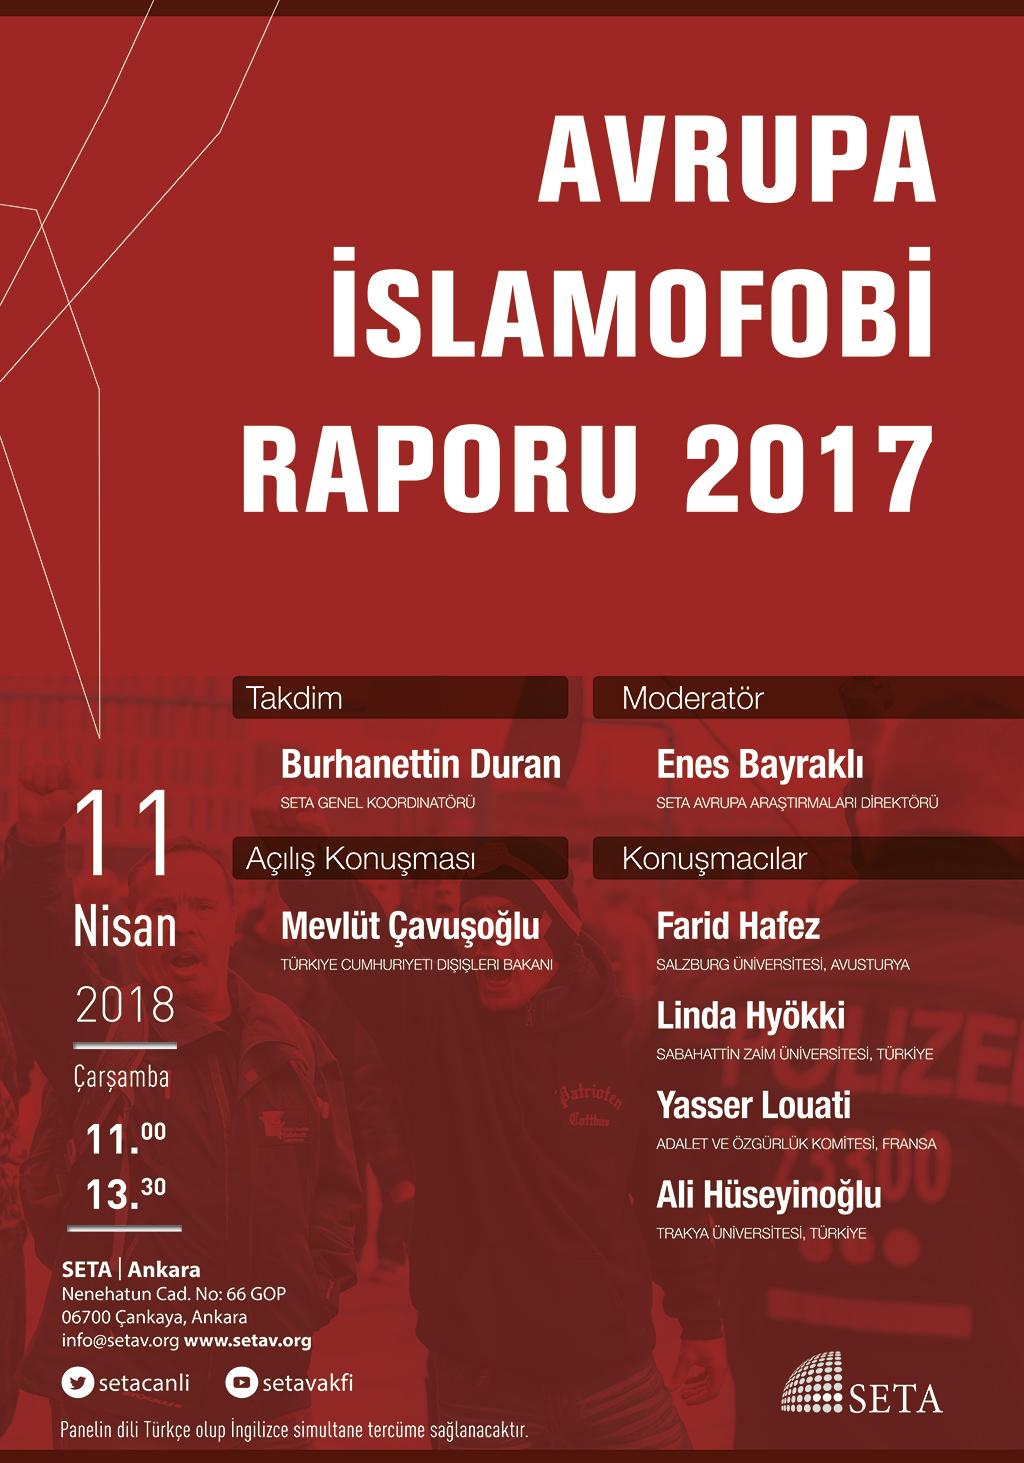 Panel: Avrupa İslamofobi Raporu 2017